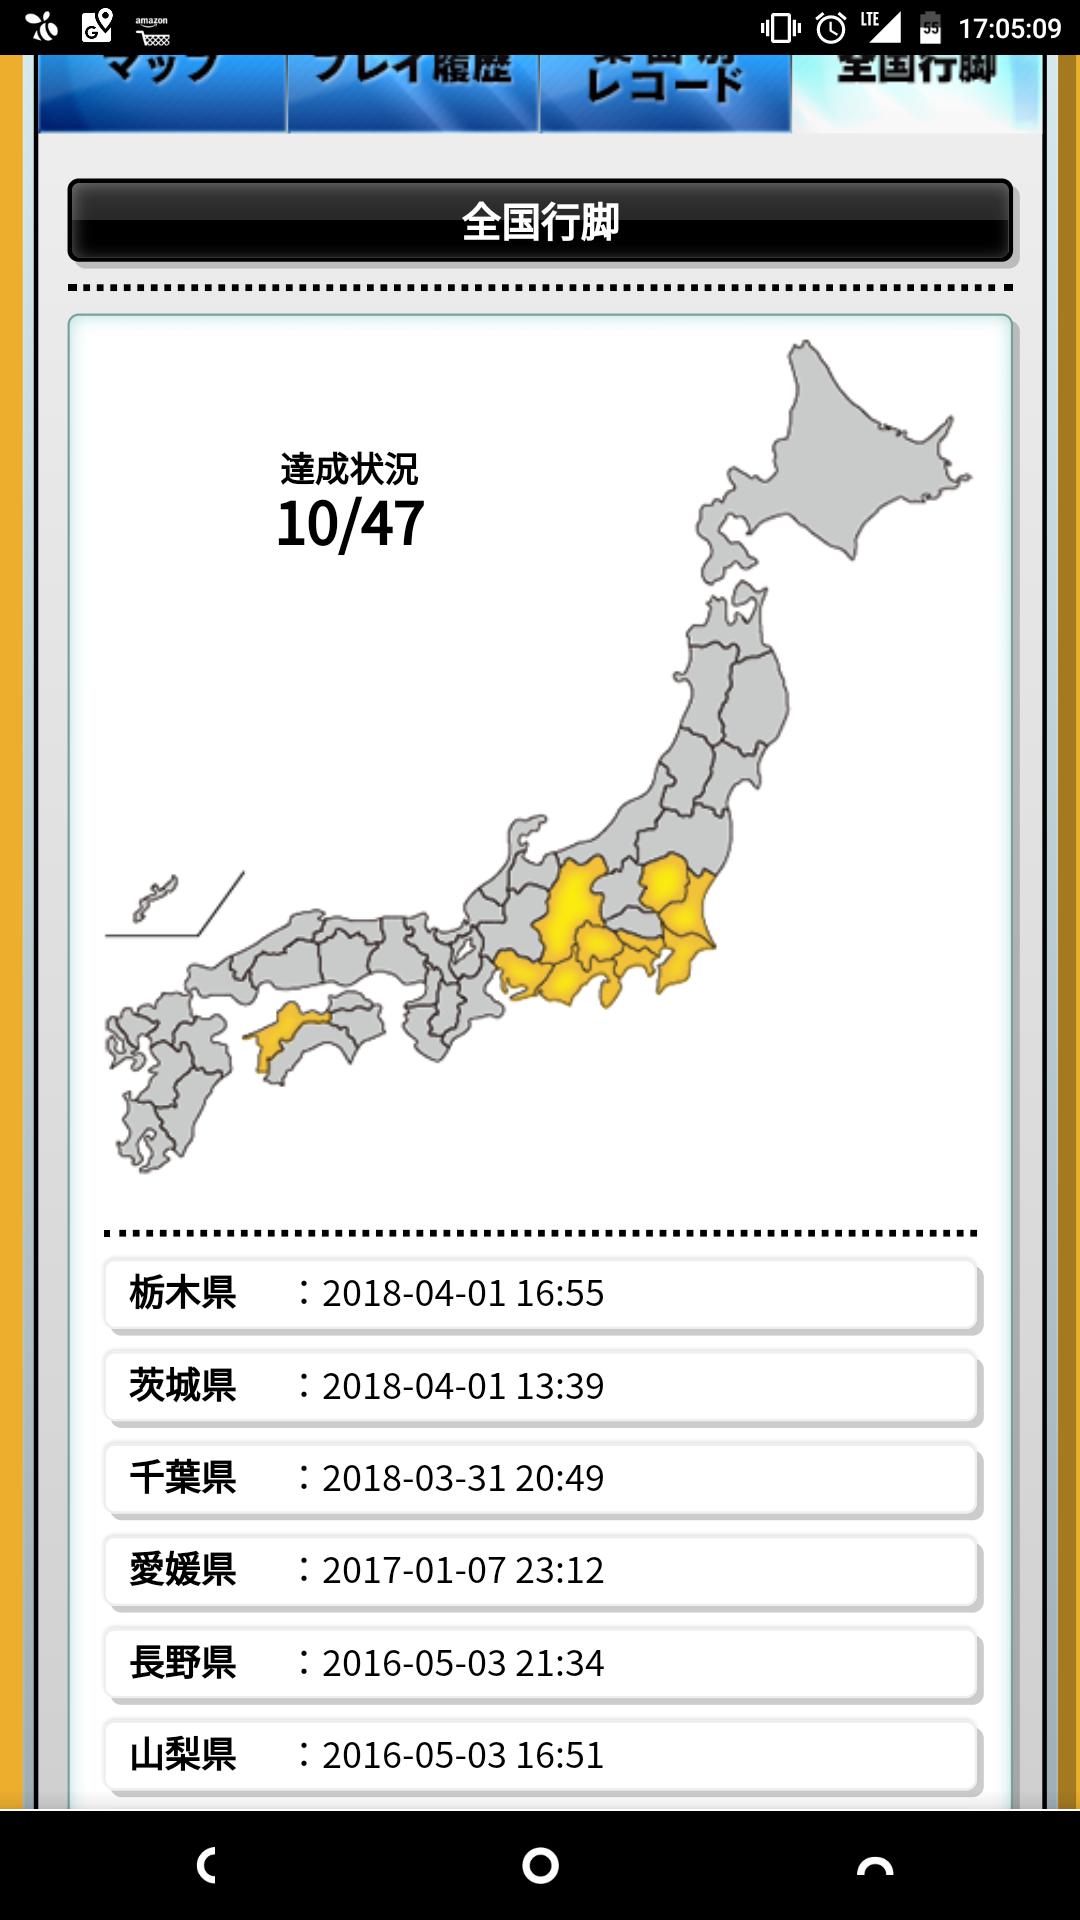 2018-04-01-17.05.12